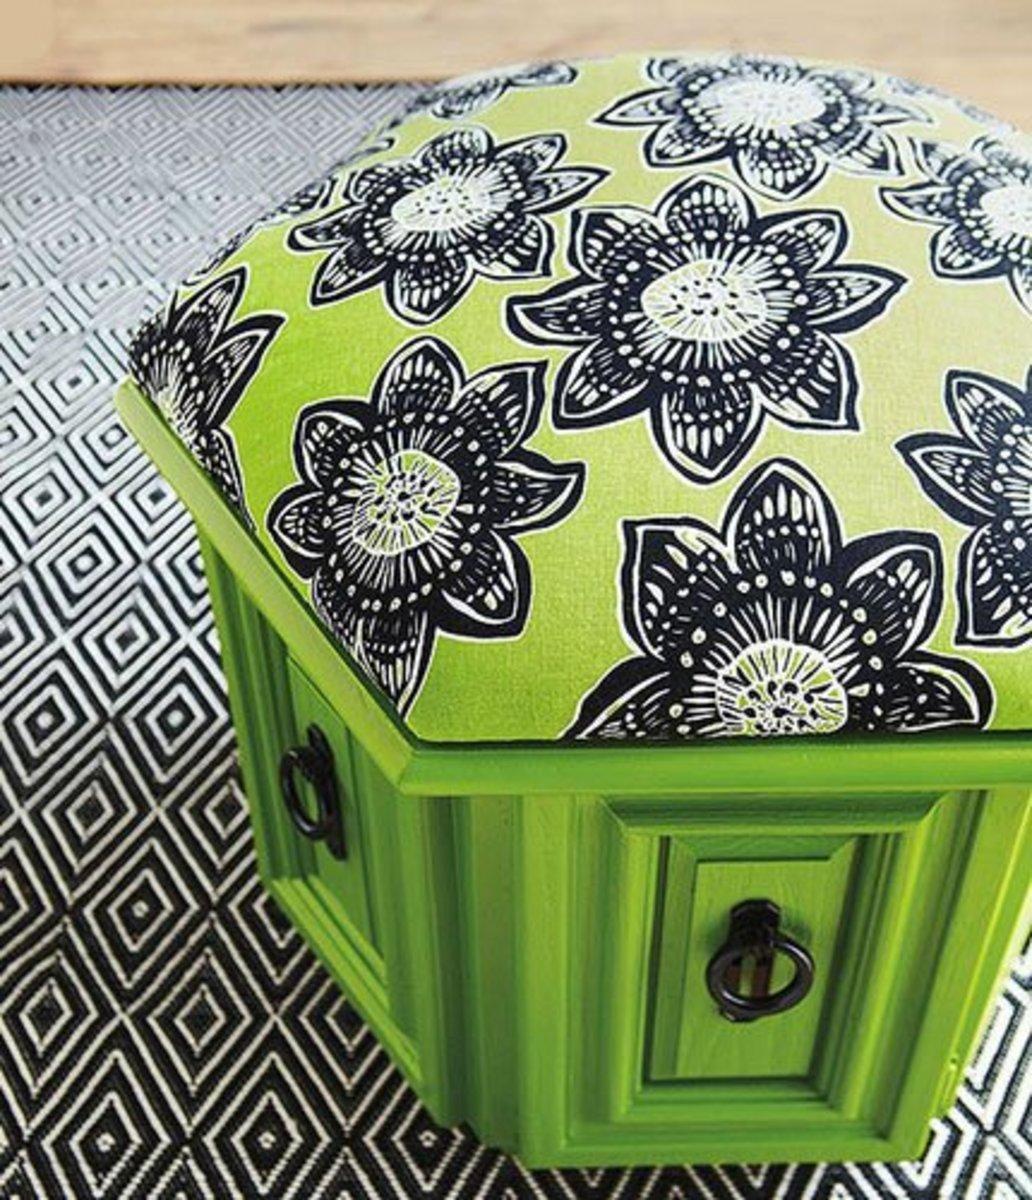 DIY Pouf Tutorial | Easy and Creative Decor Ideas | Click for Tutorial